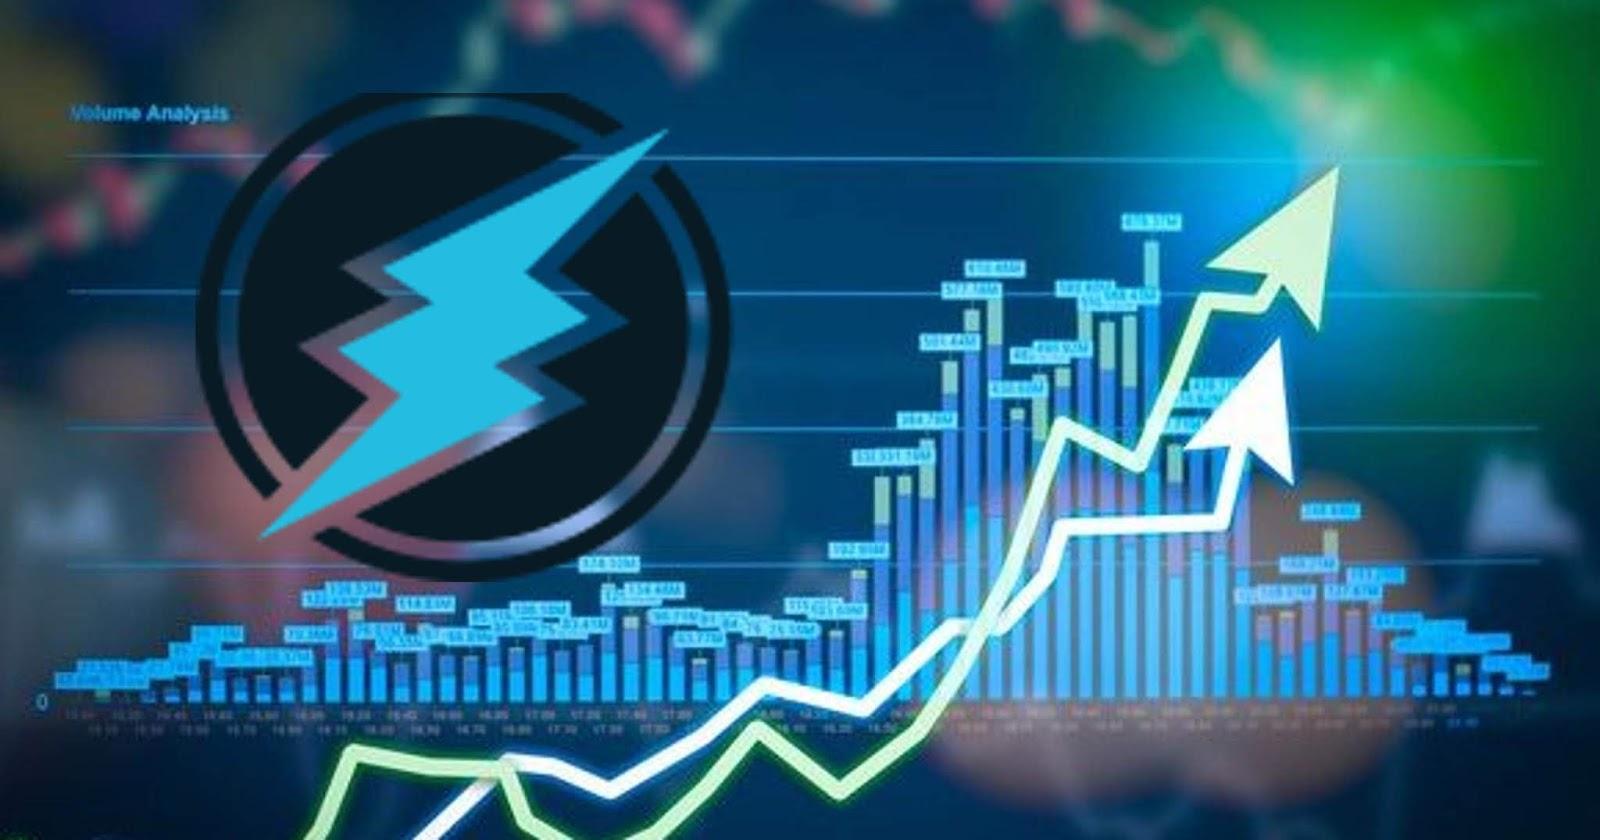 Electroneum Price Prediction for 2019